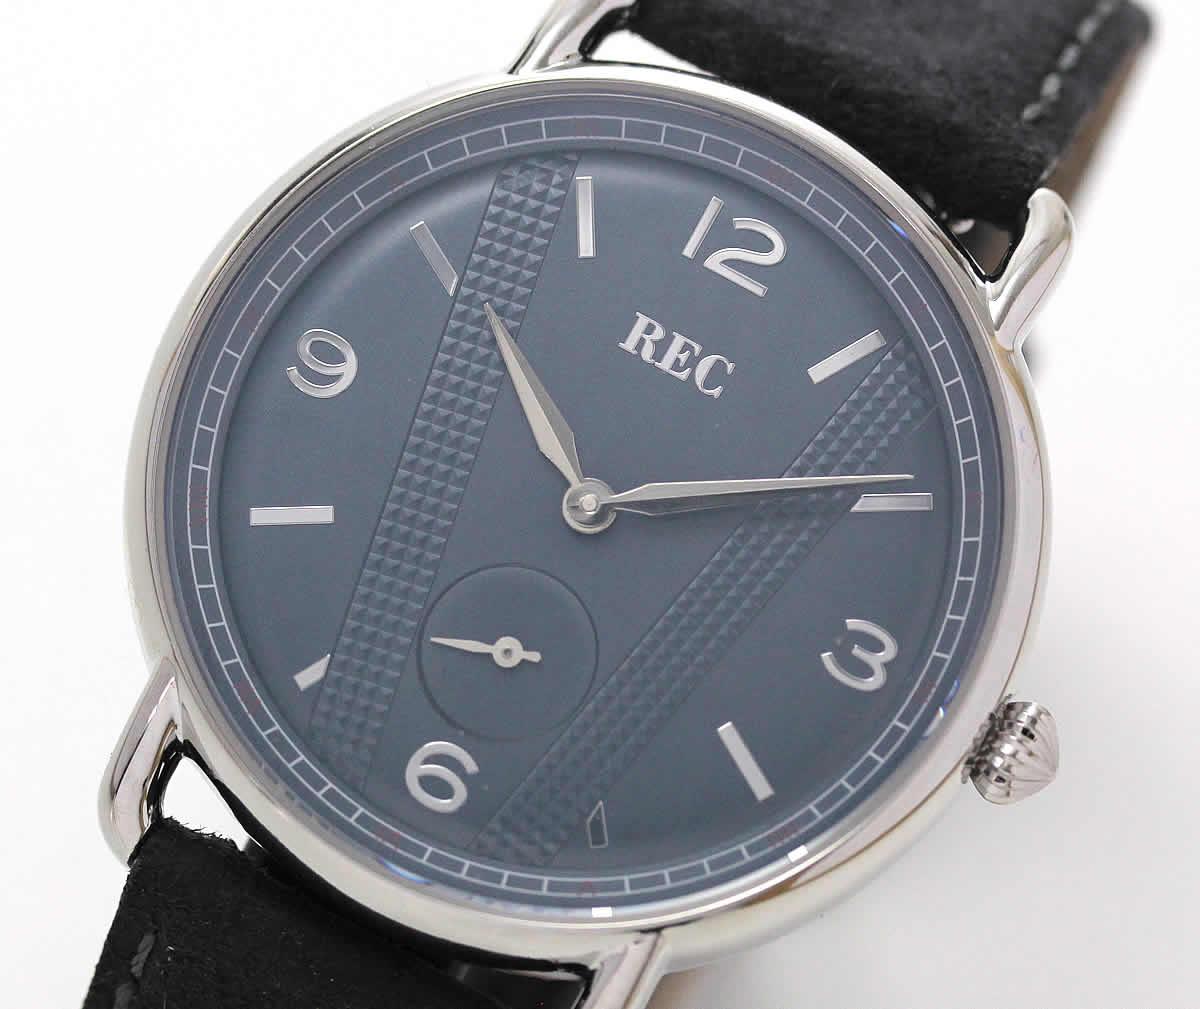 Miniクーパー 腕時計